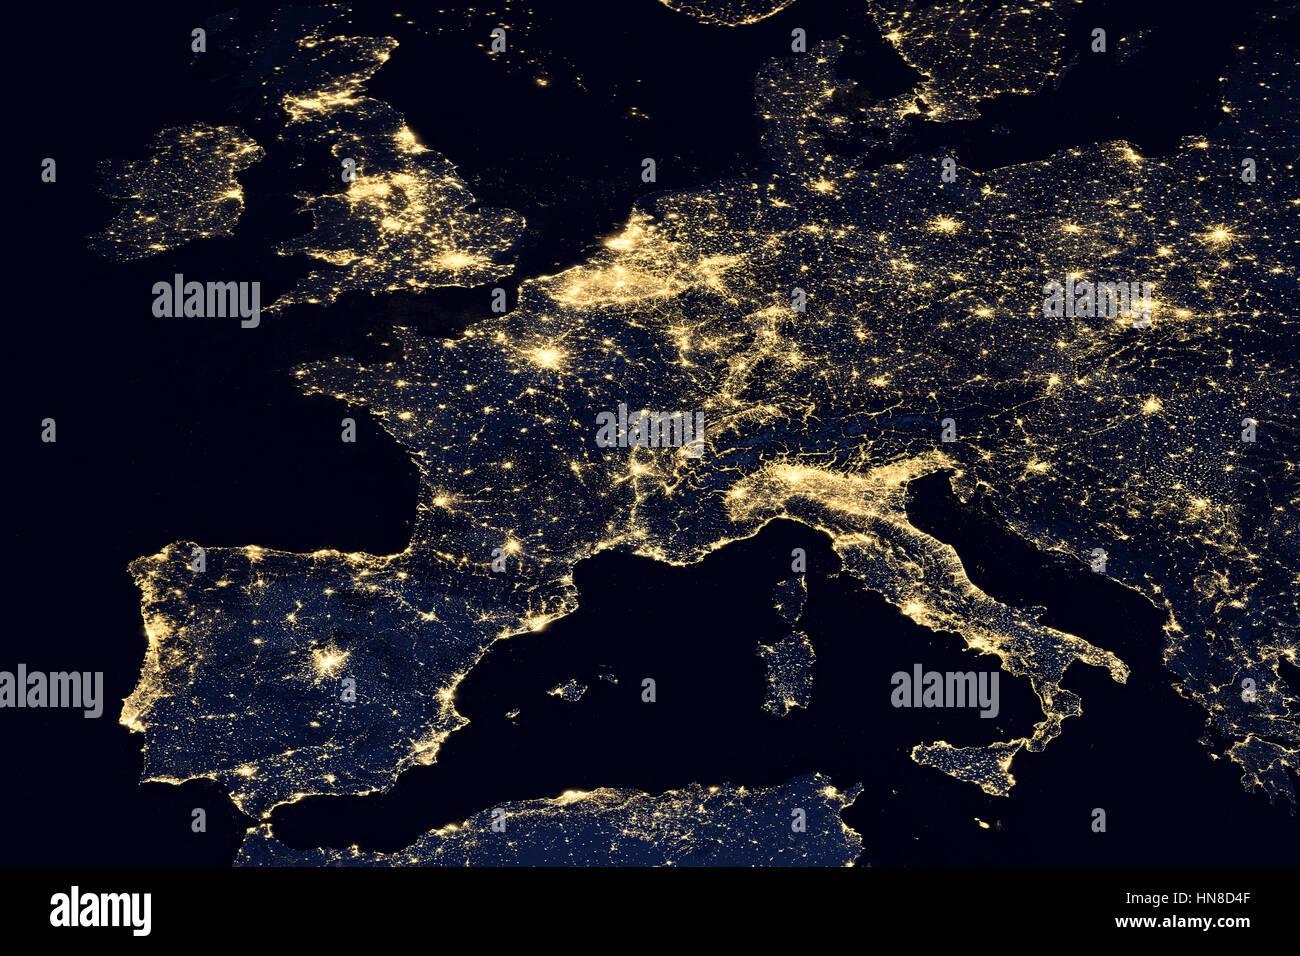 City lights on world map europe stock photo royalty free image city lights on world map europe gumiabroncs Choice Image